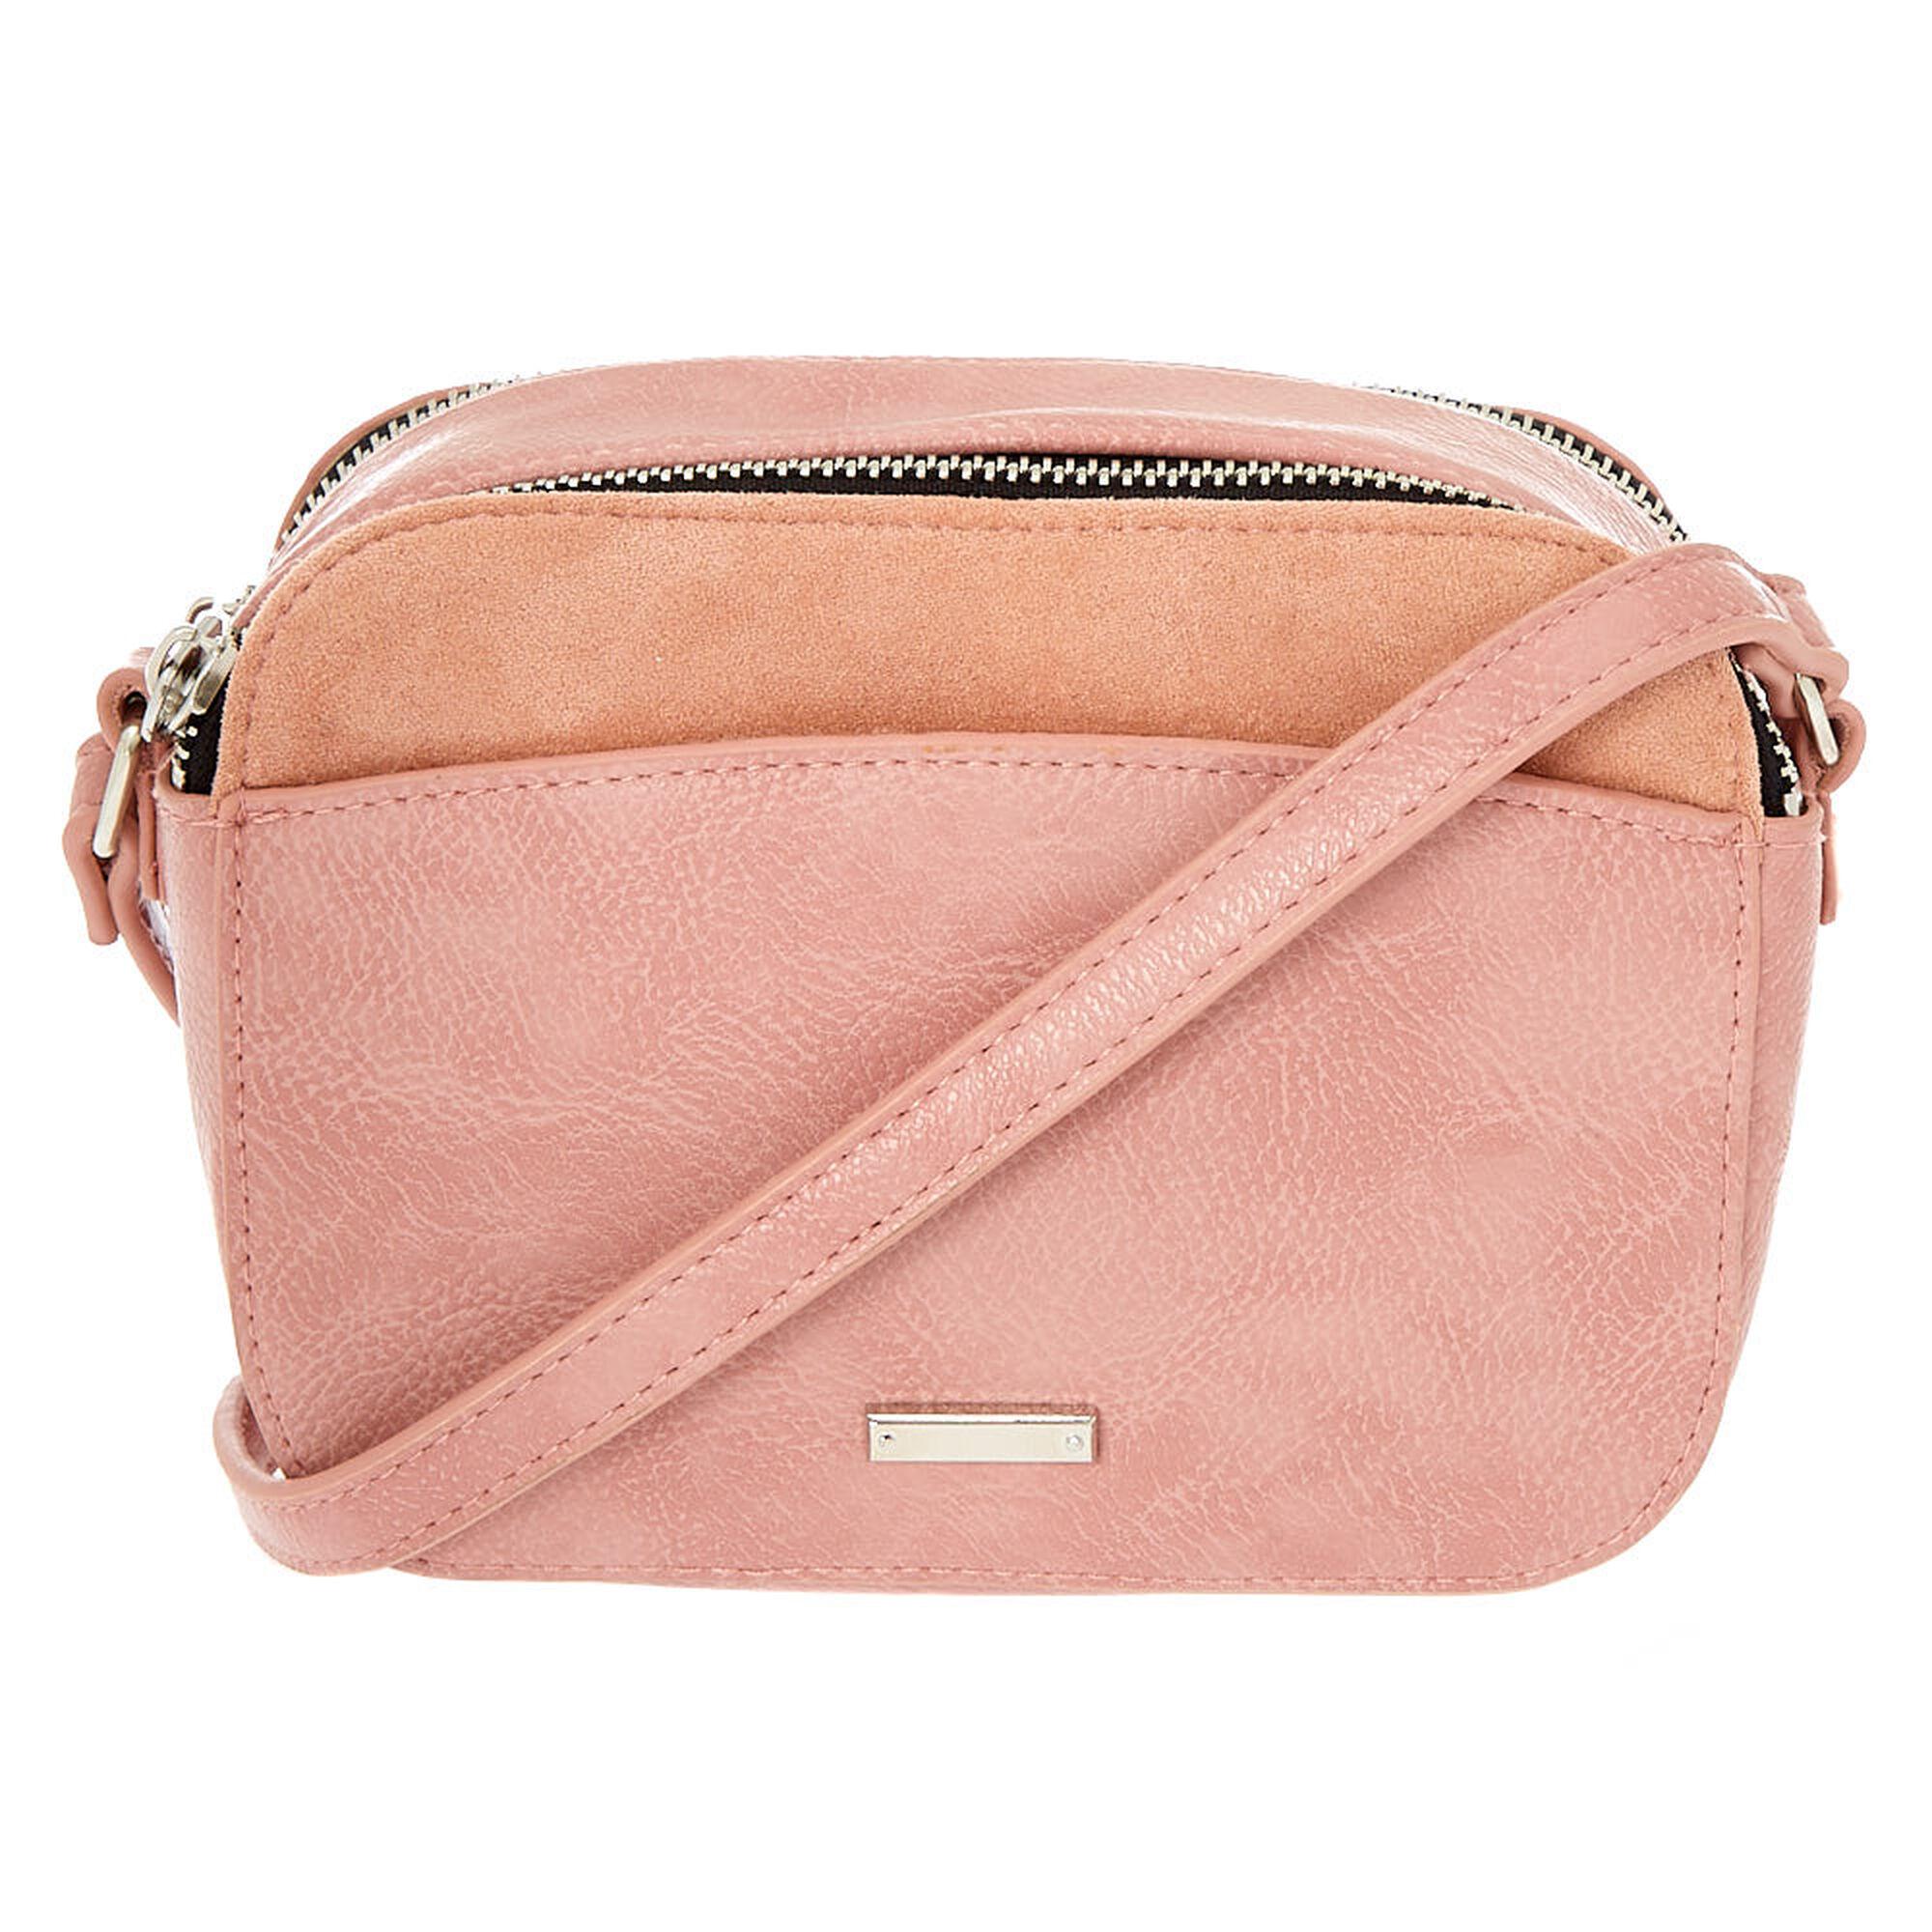 03399e66af Faux Leather Camera Crossbody Bag - Pink